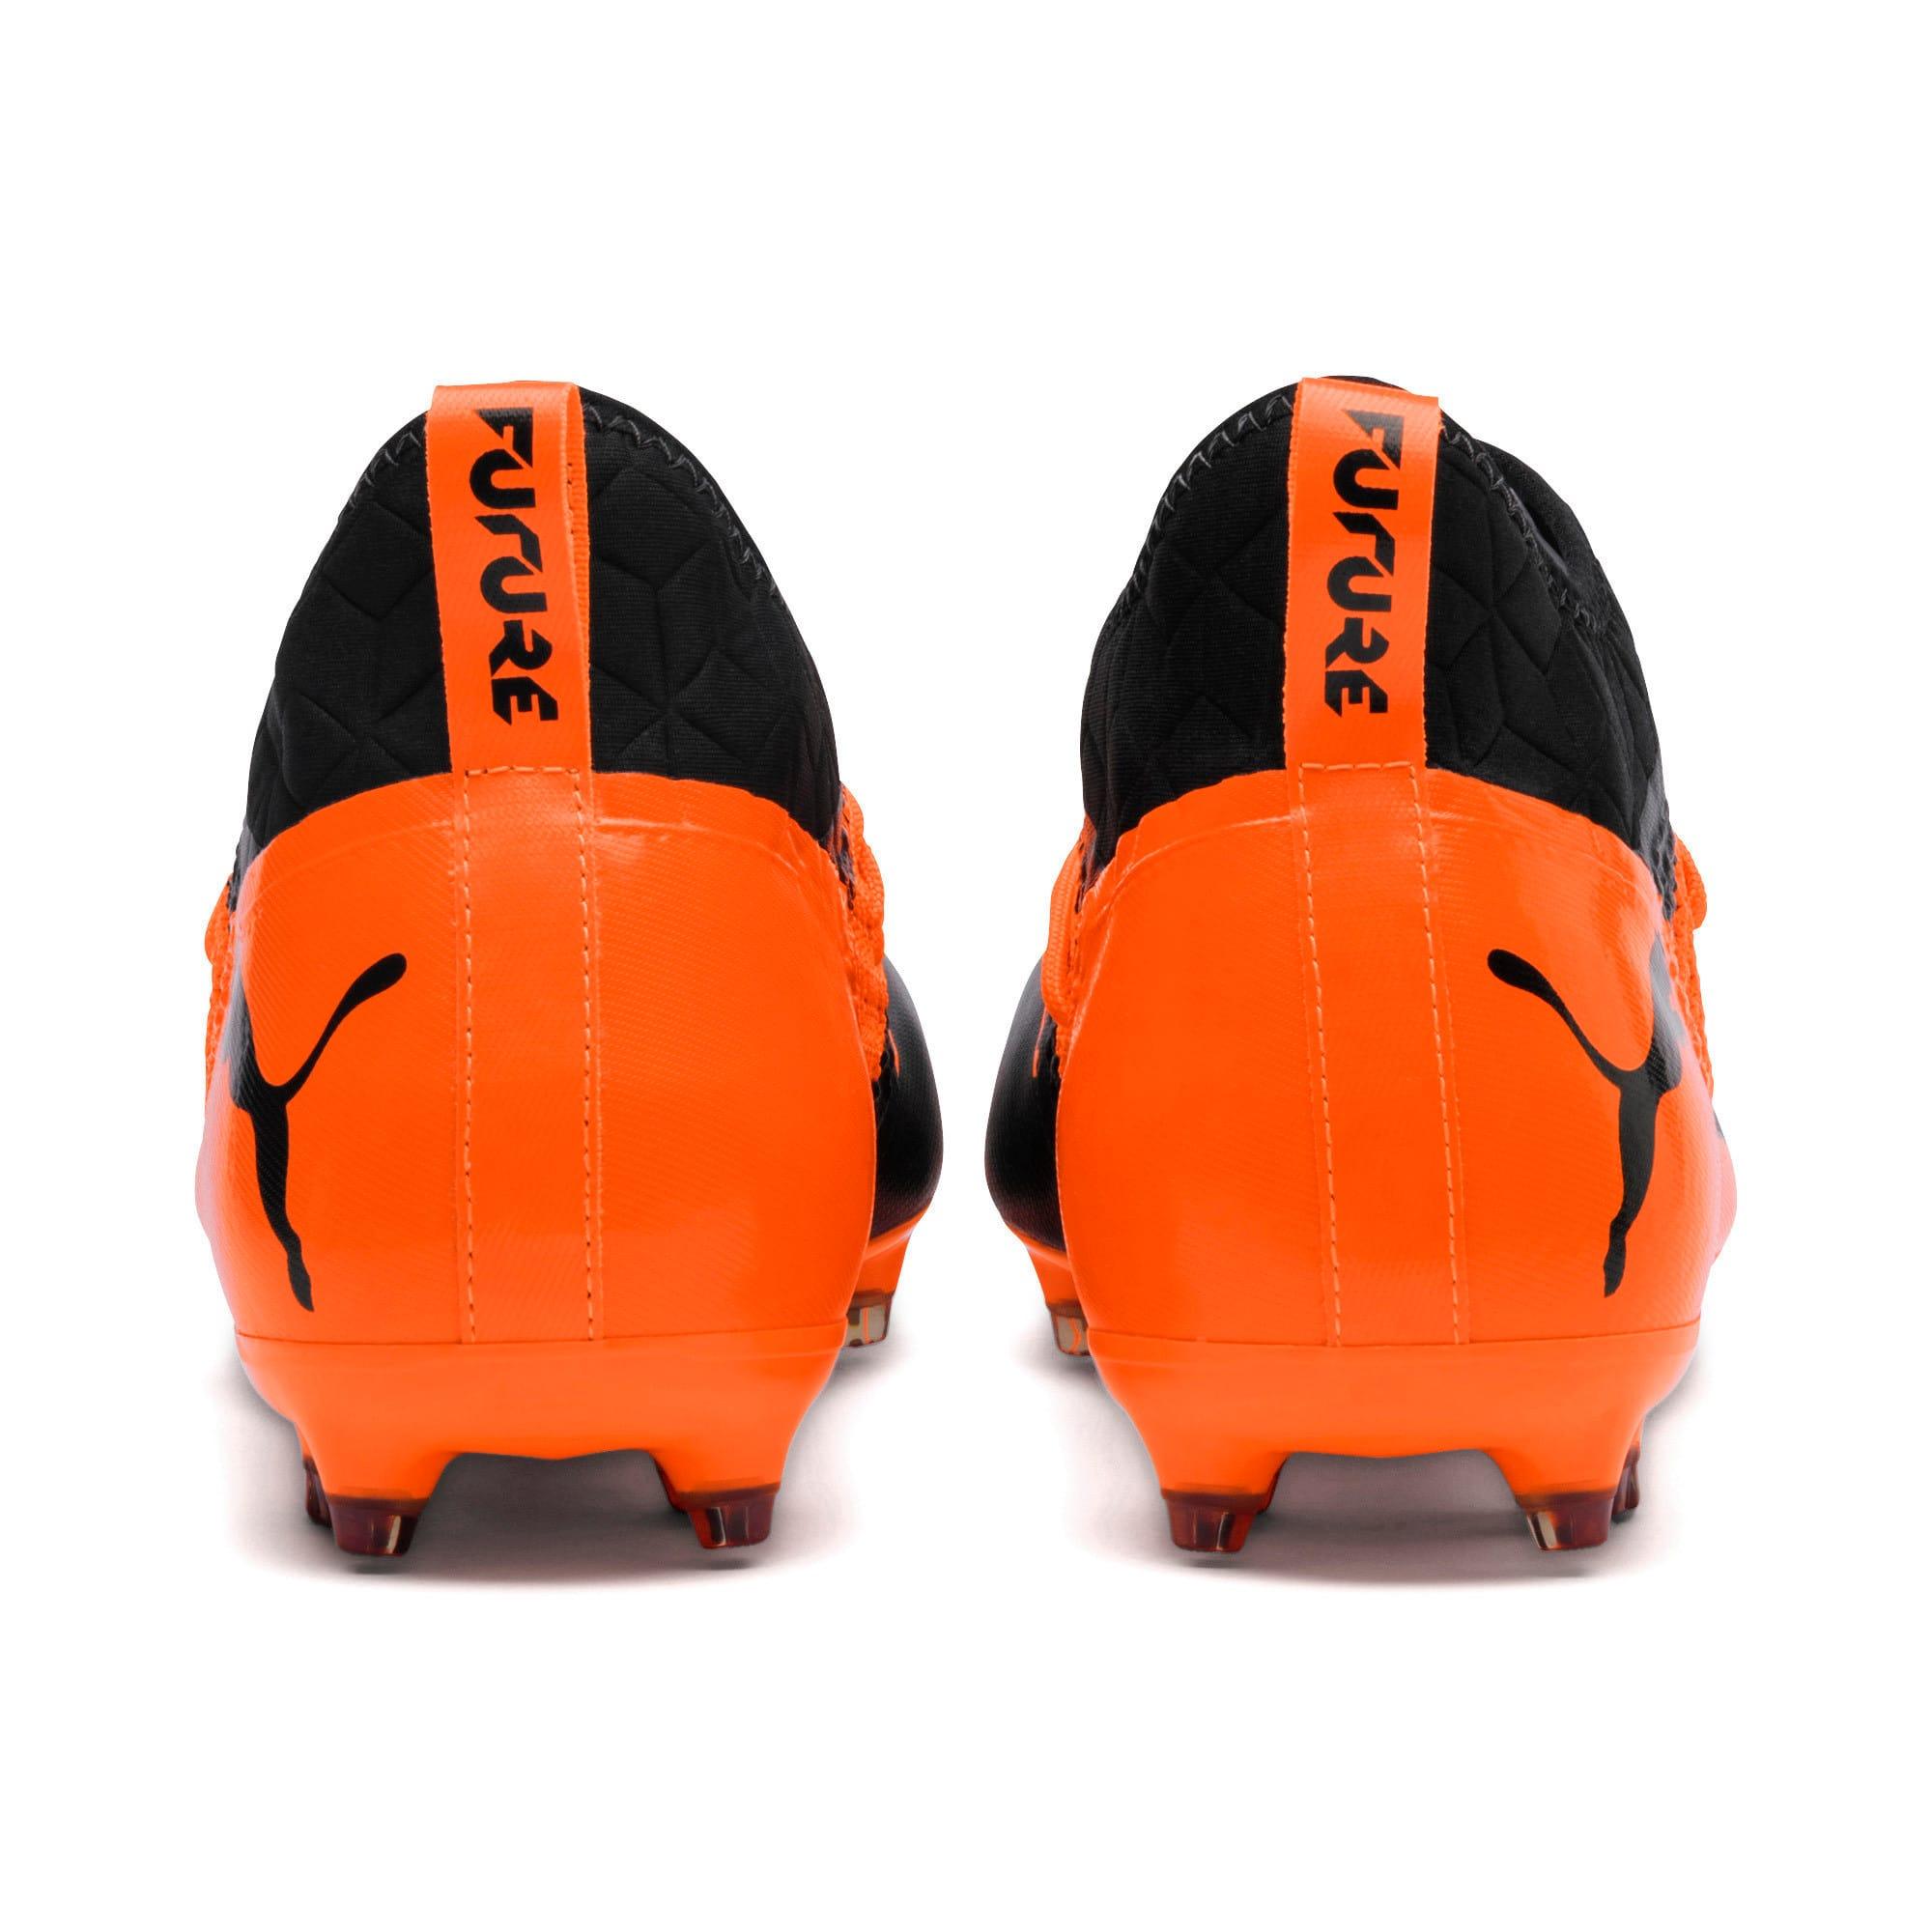 Thumbnail 2 of FUTURE 2.3 NETFIT FG/AG  Football Boots, Puma Black-Shocking Orange, medium-IND